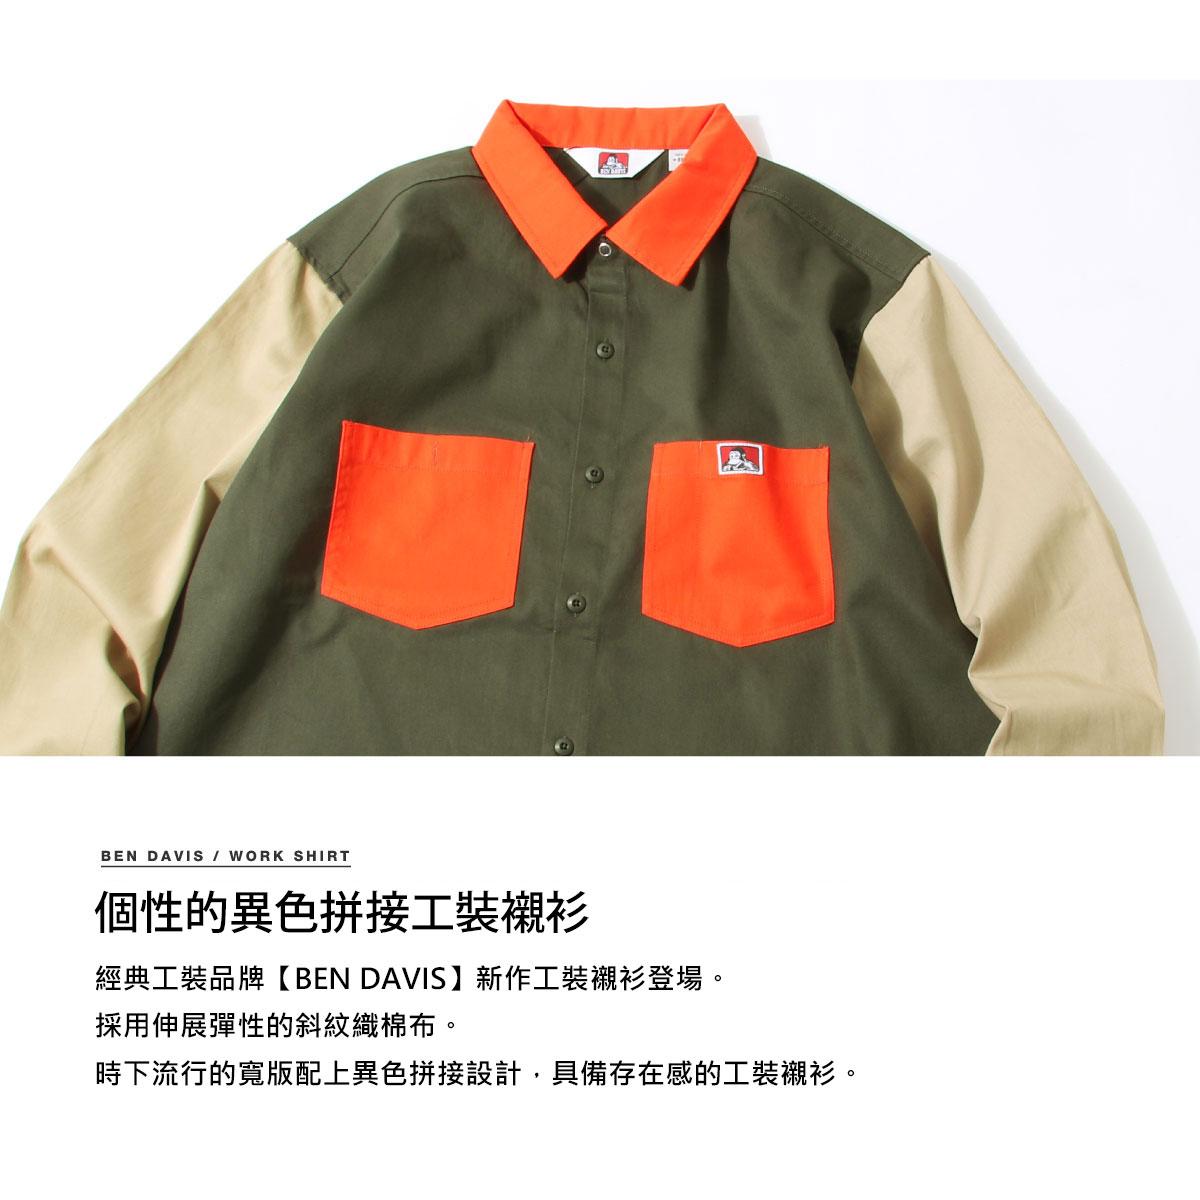 【BEN DAVIS】異色拼接工裝襯衫 7